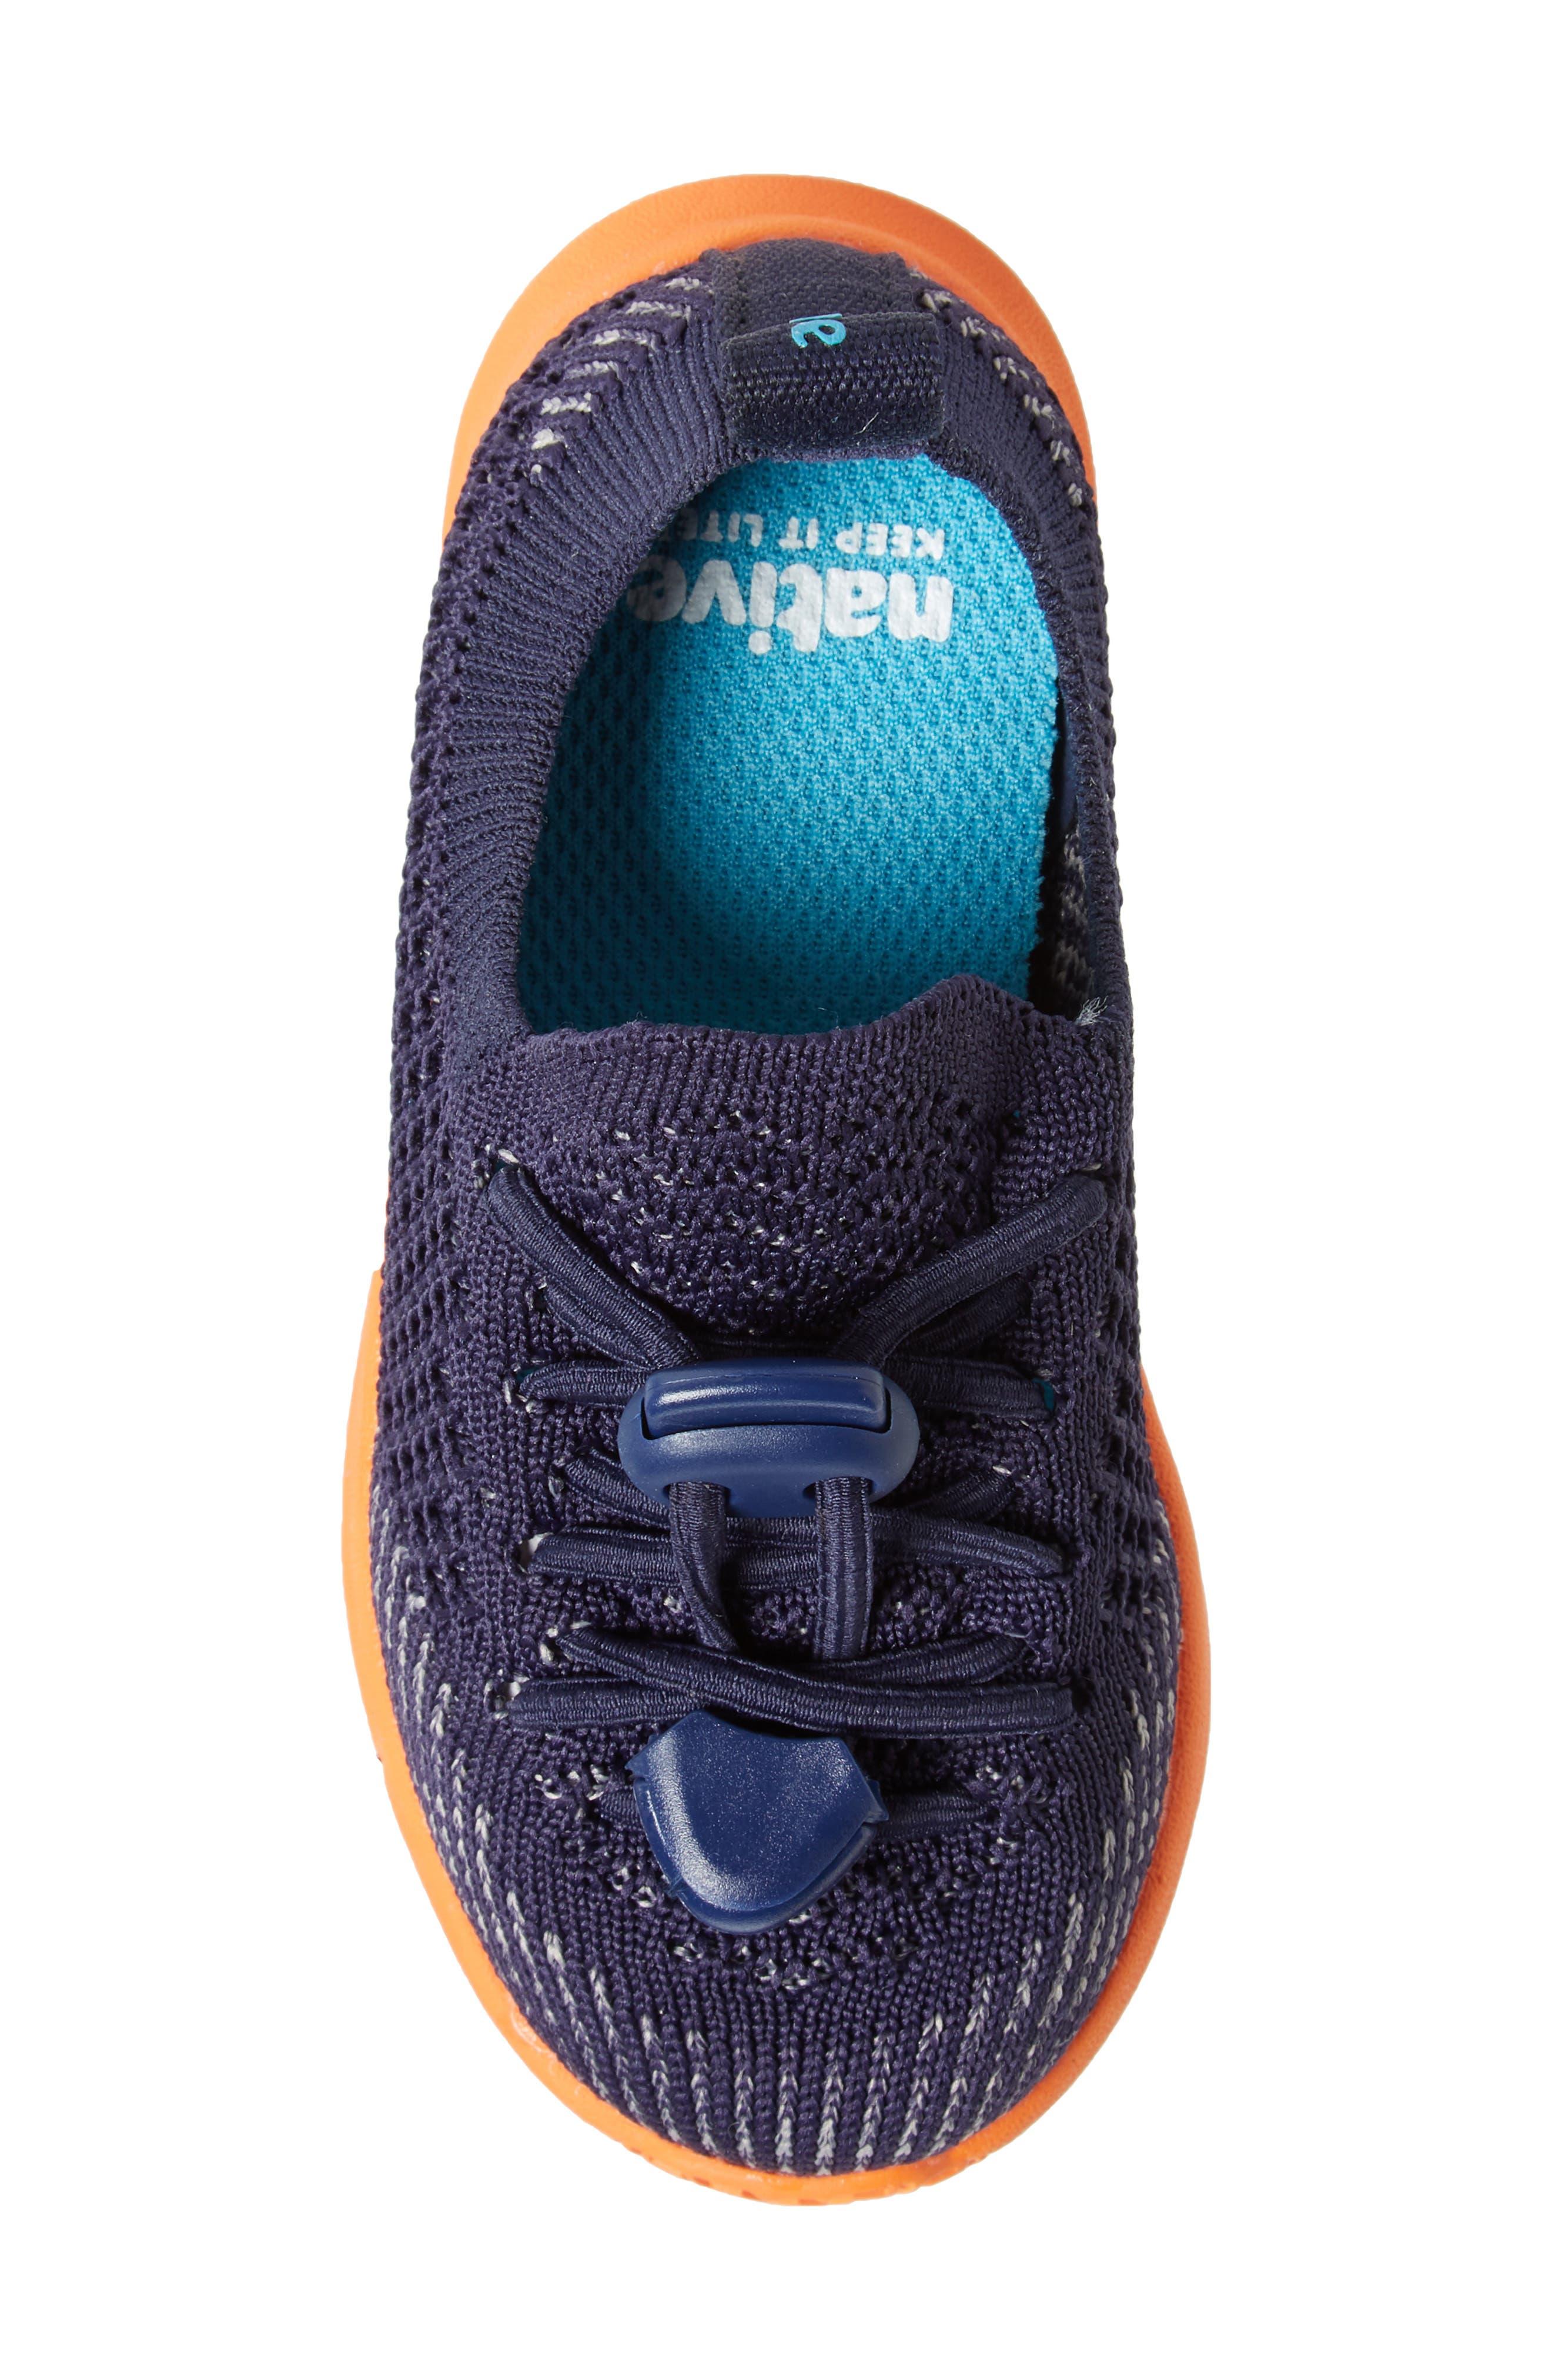 AP Mercury LiteKnit Sneaker,                             Alternate thumbnail 5, color,                             REGATTA BLUE/ SUNSET ORANGE